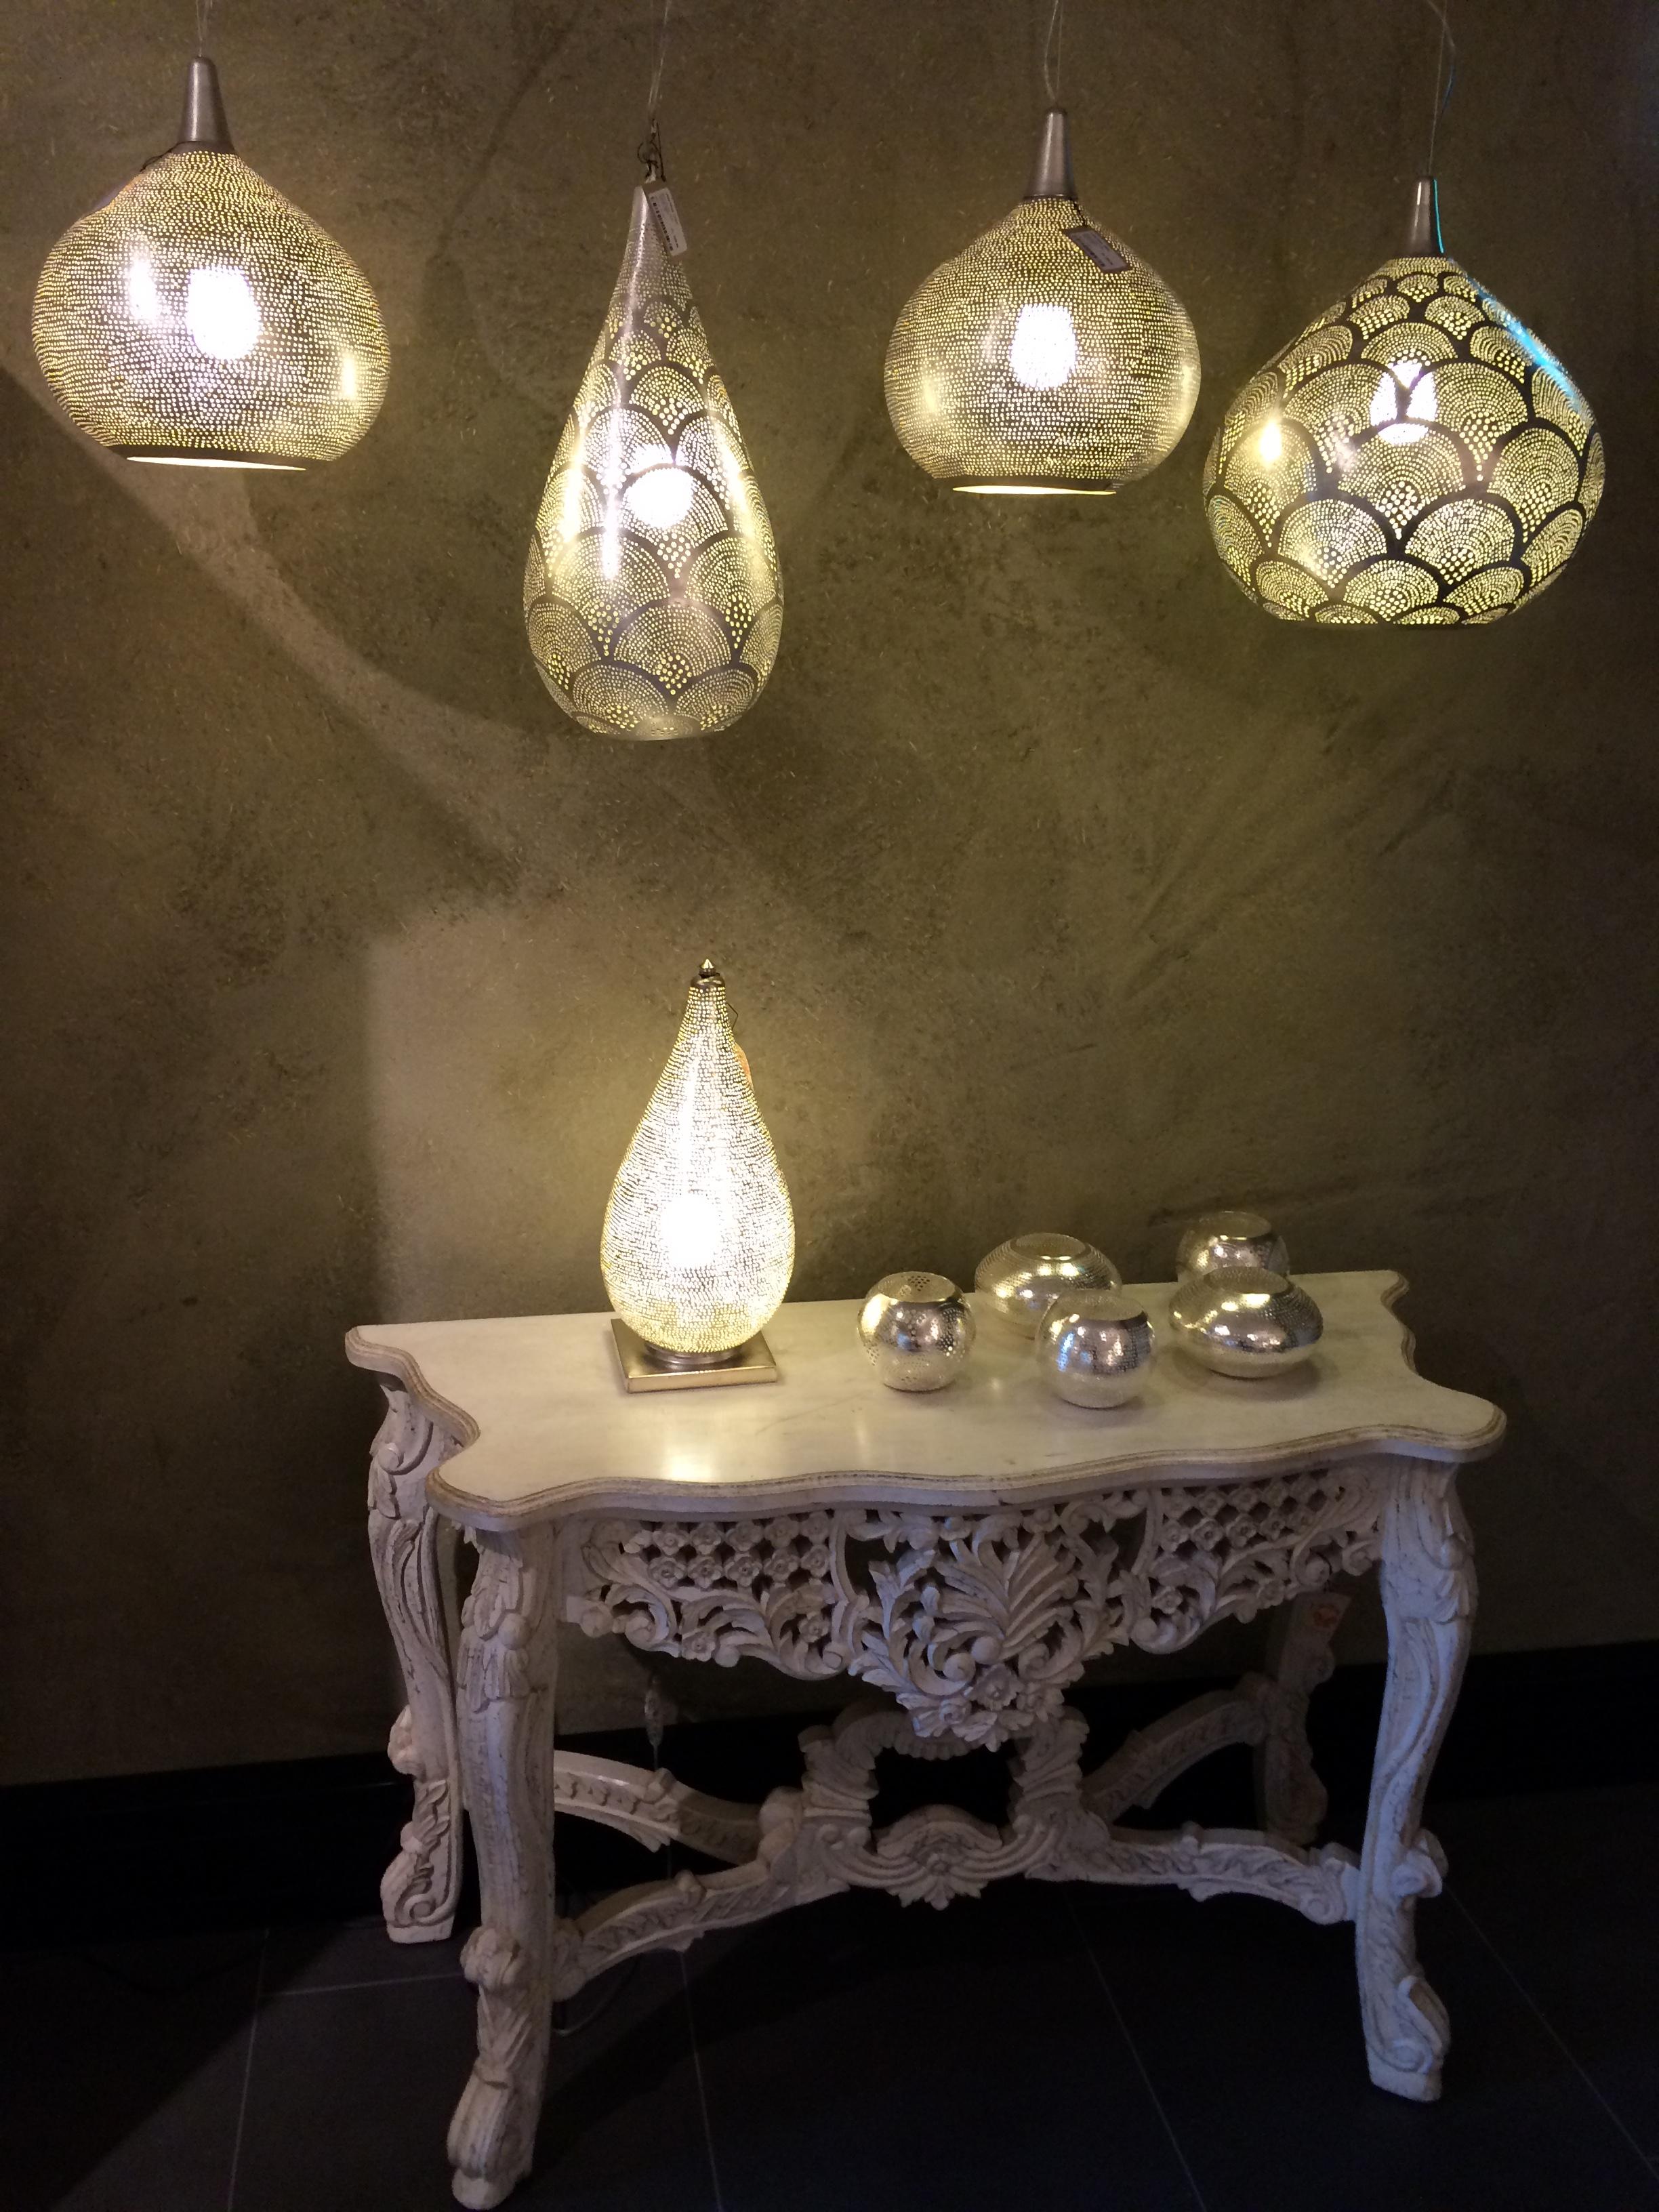 36 - silver lights, Morocco